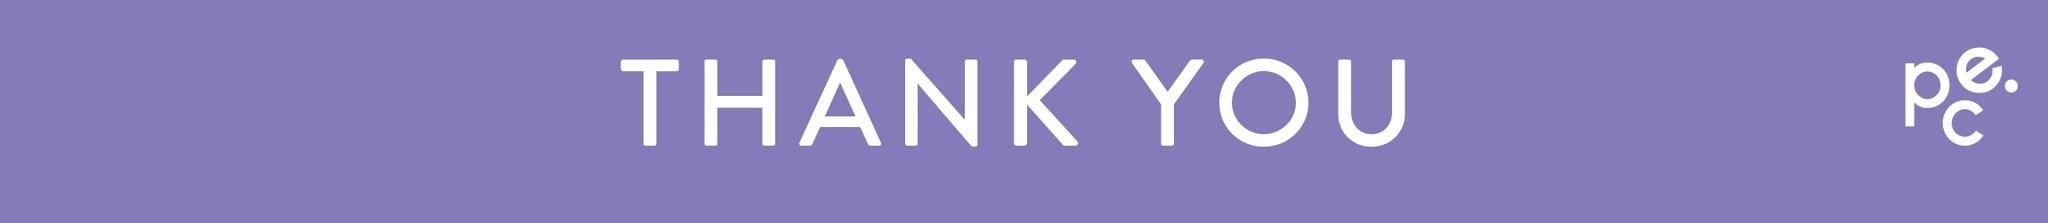 Strip - Thank You|Paper E. Clips